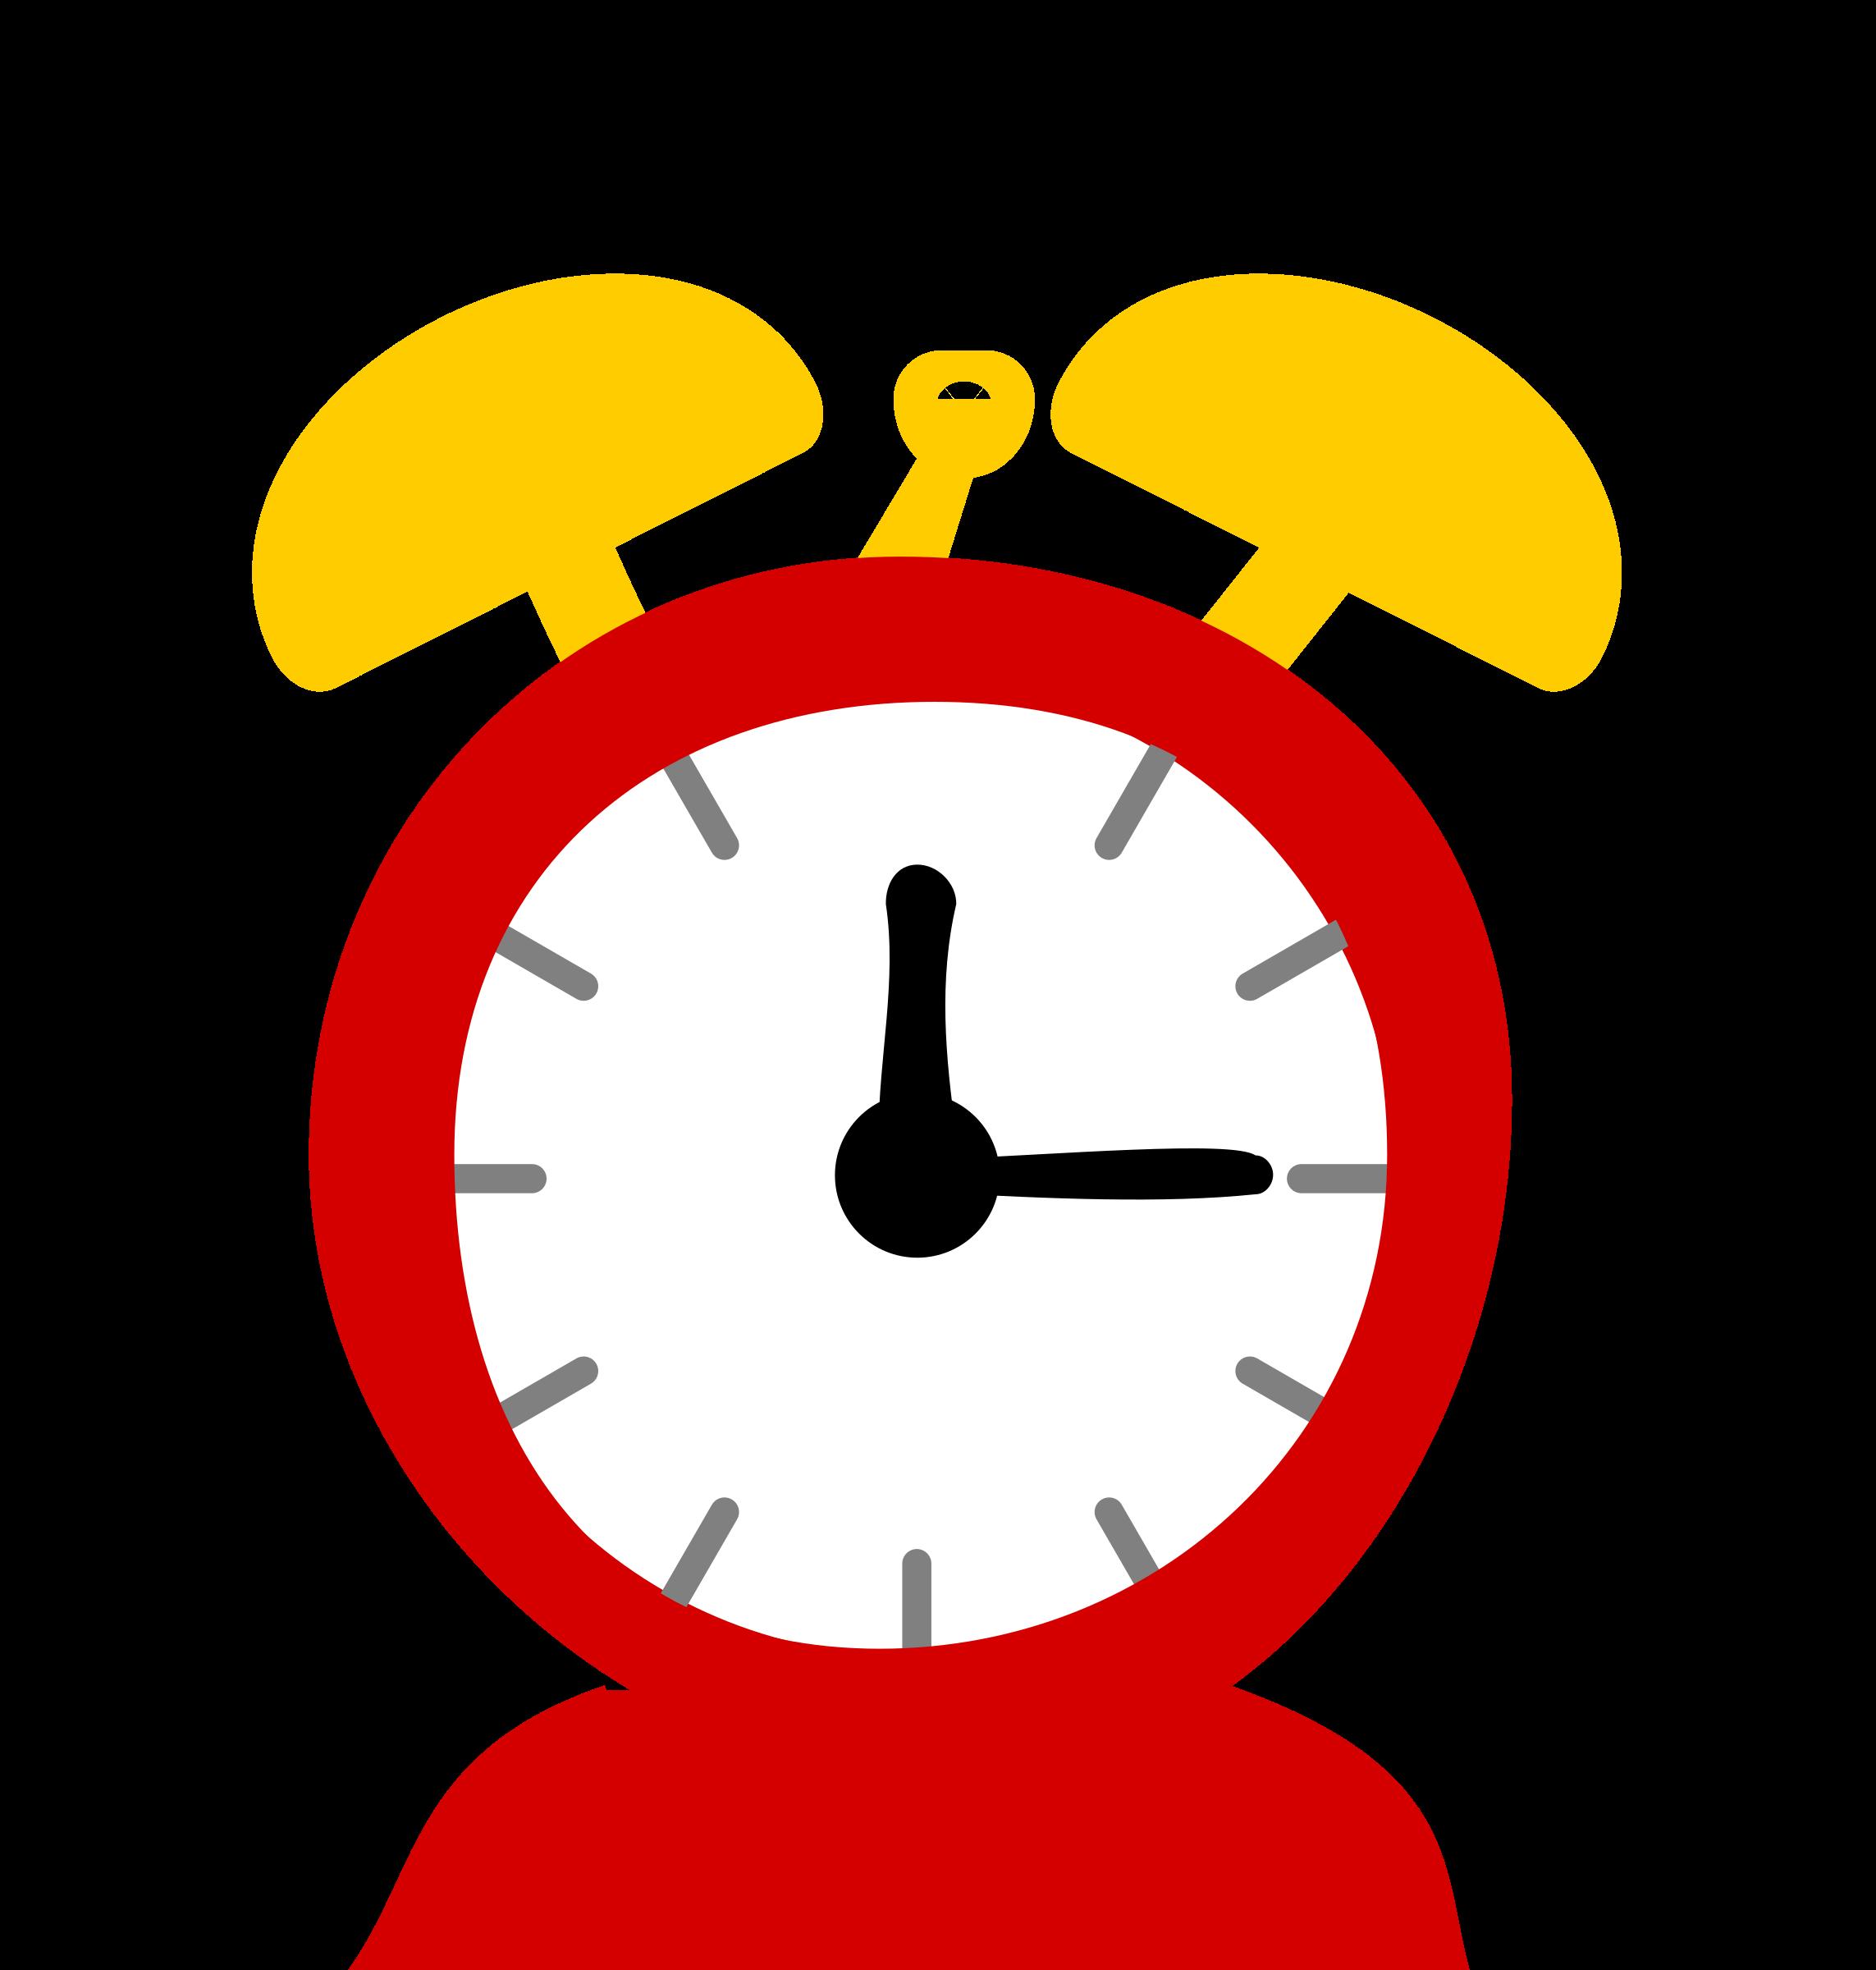 alarm clipart. Alarm Clock By Krzysiu